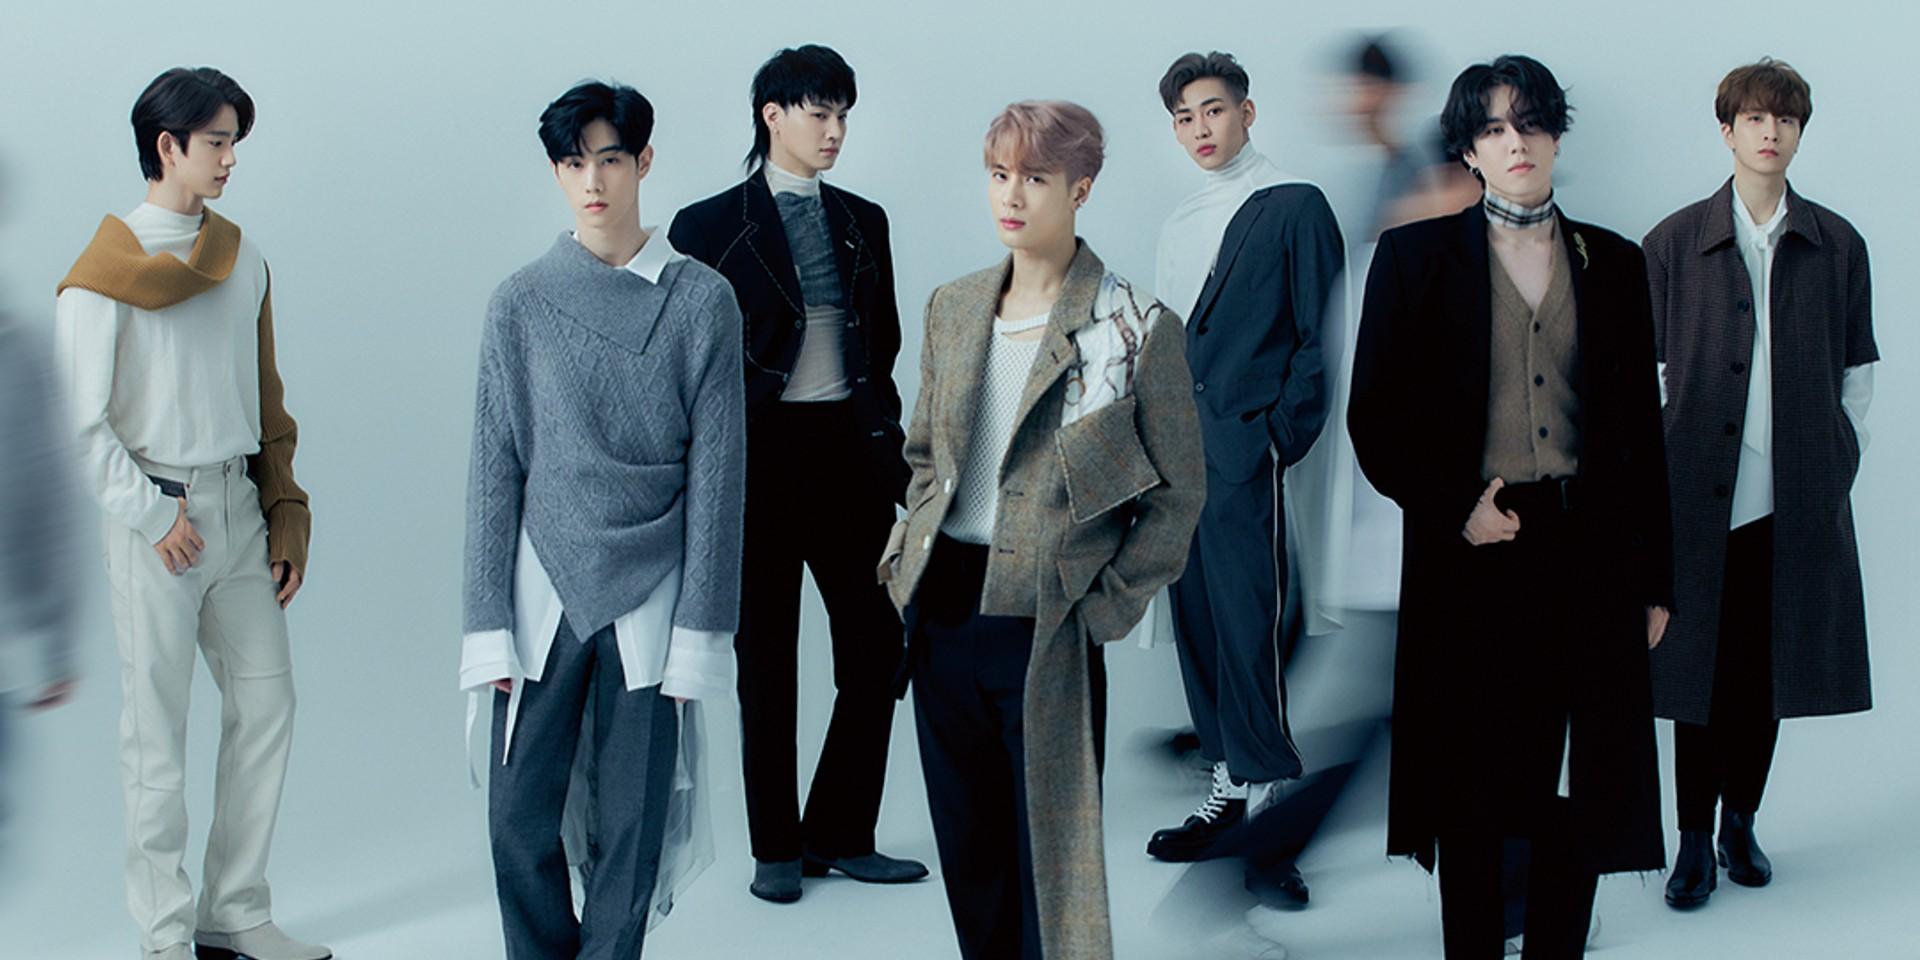 GOT7 release new album, Breath of Love: Last Piece, plus music video for 'Last Piece'